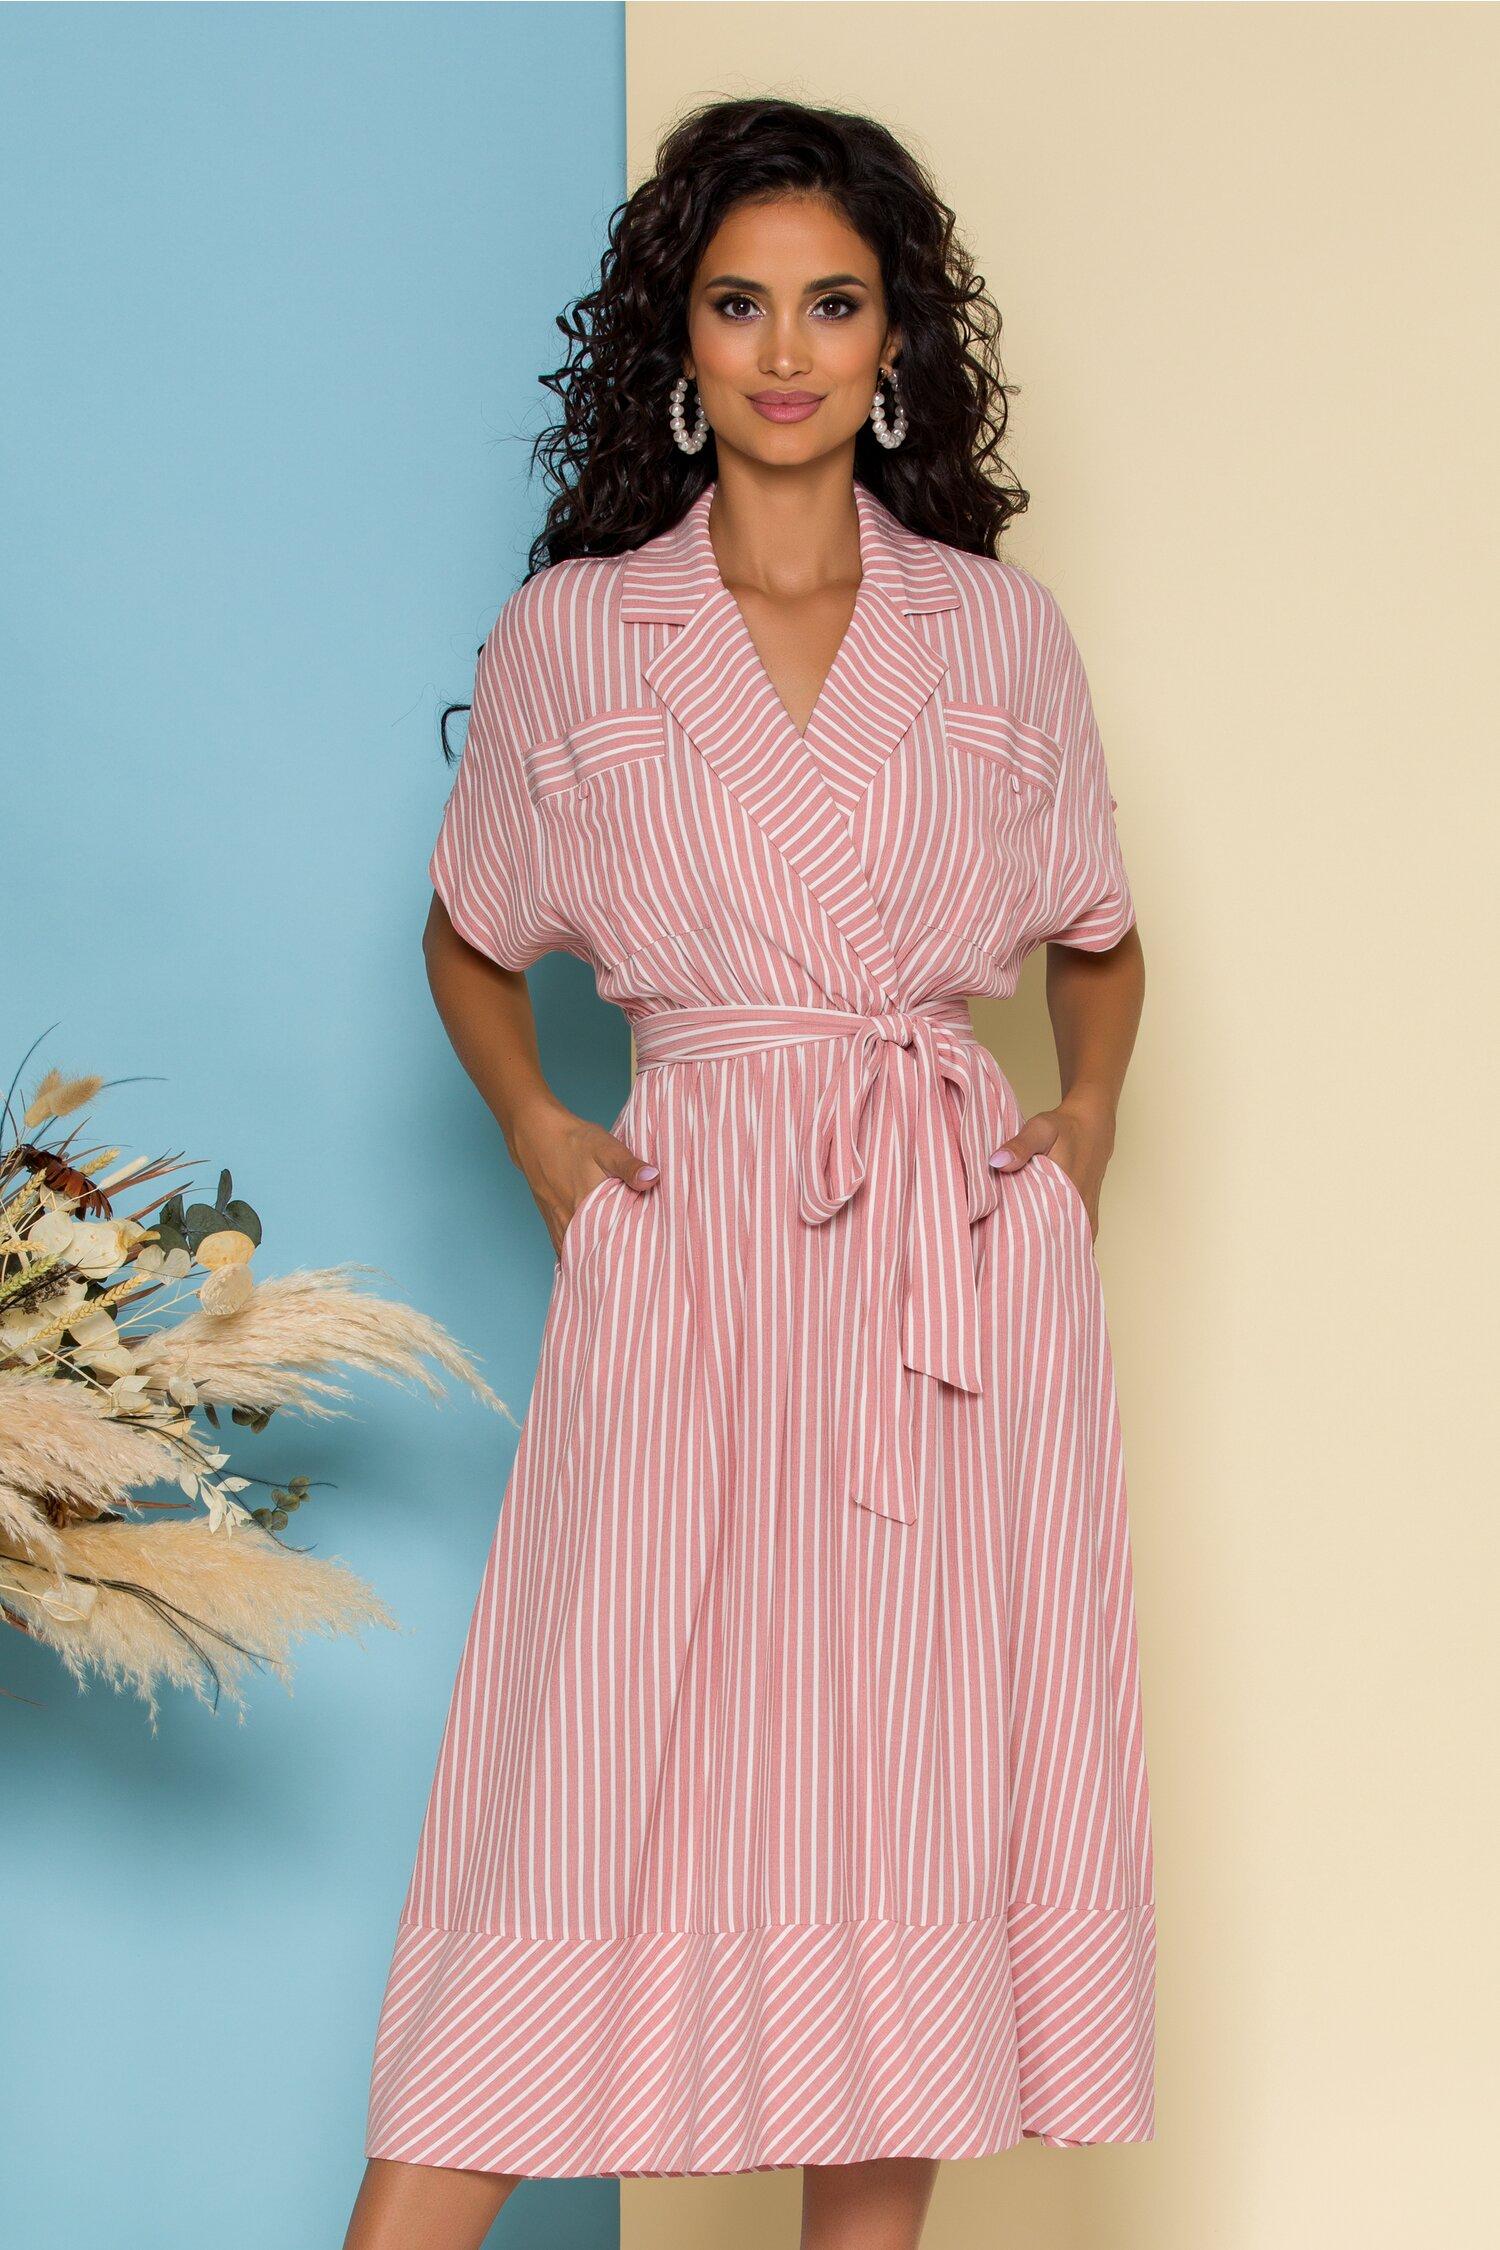 Rochie Micka roz cu dungi albe